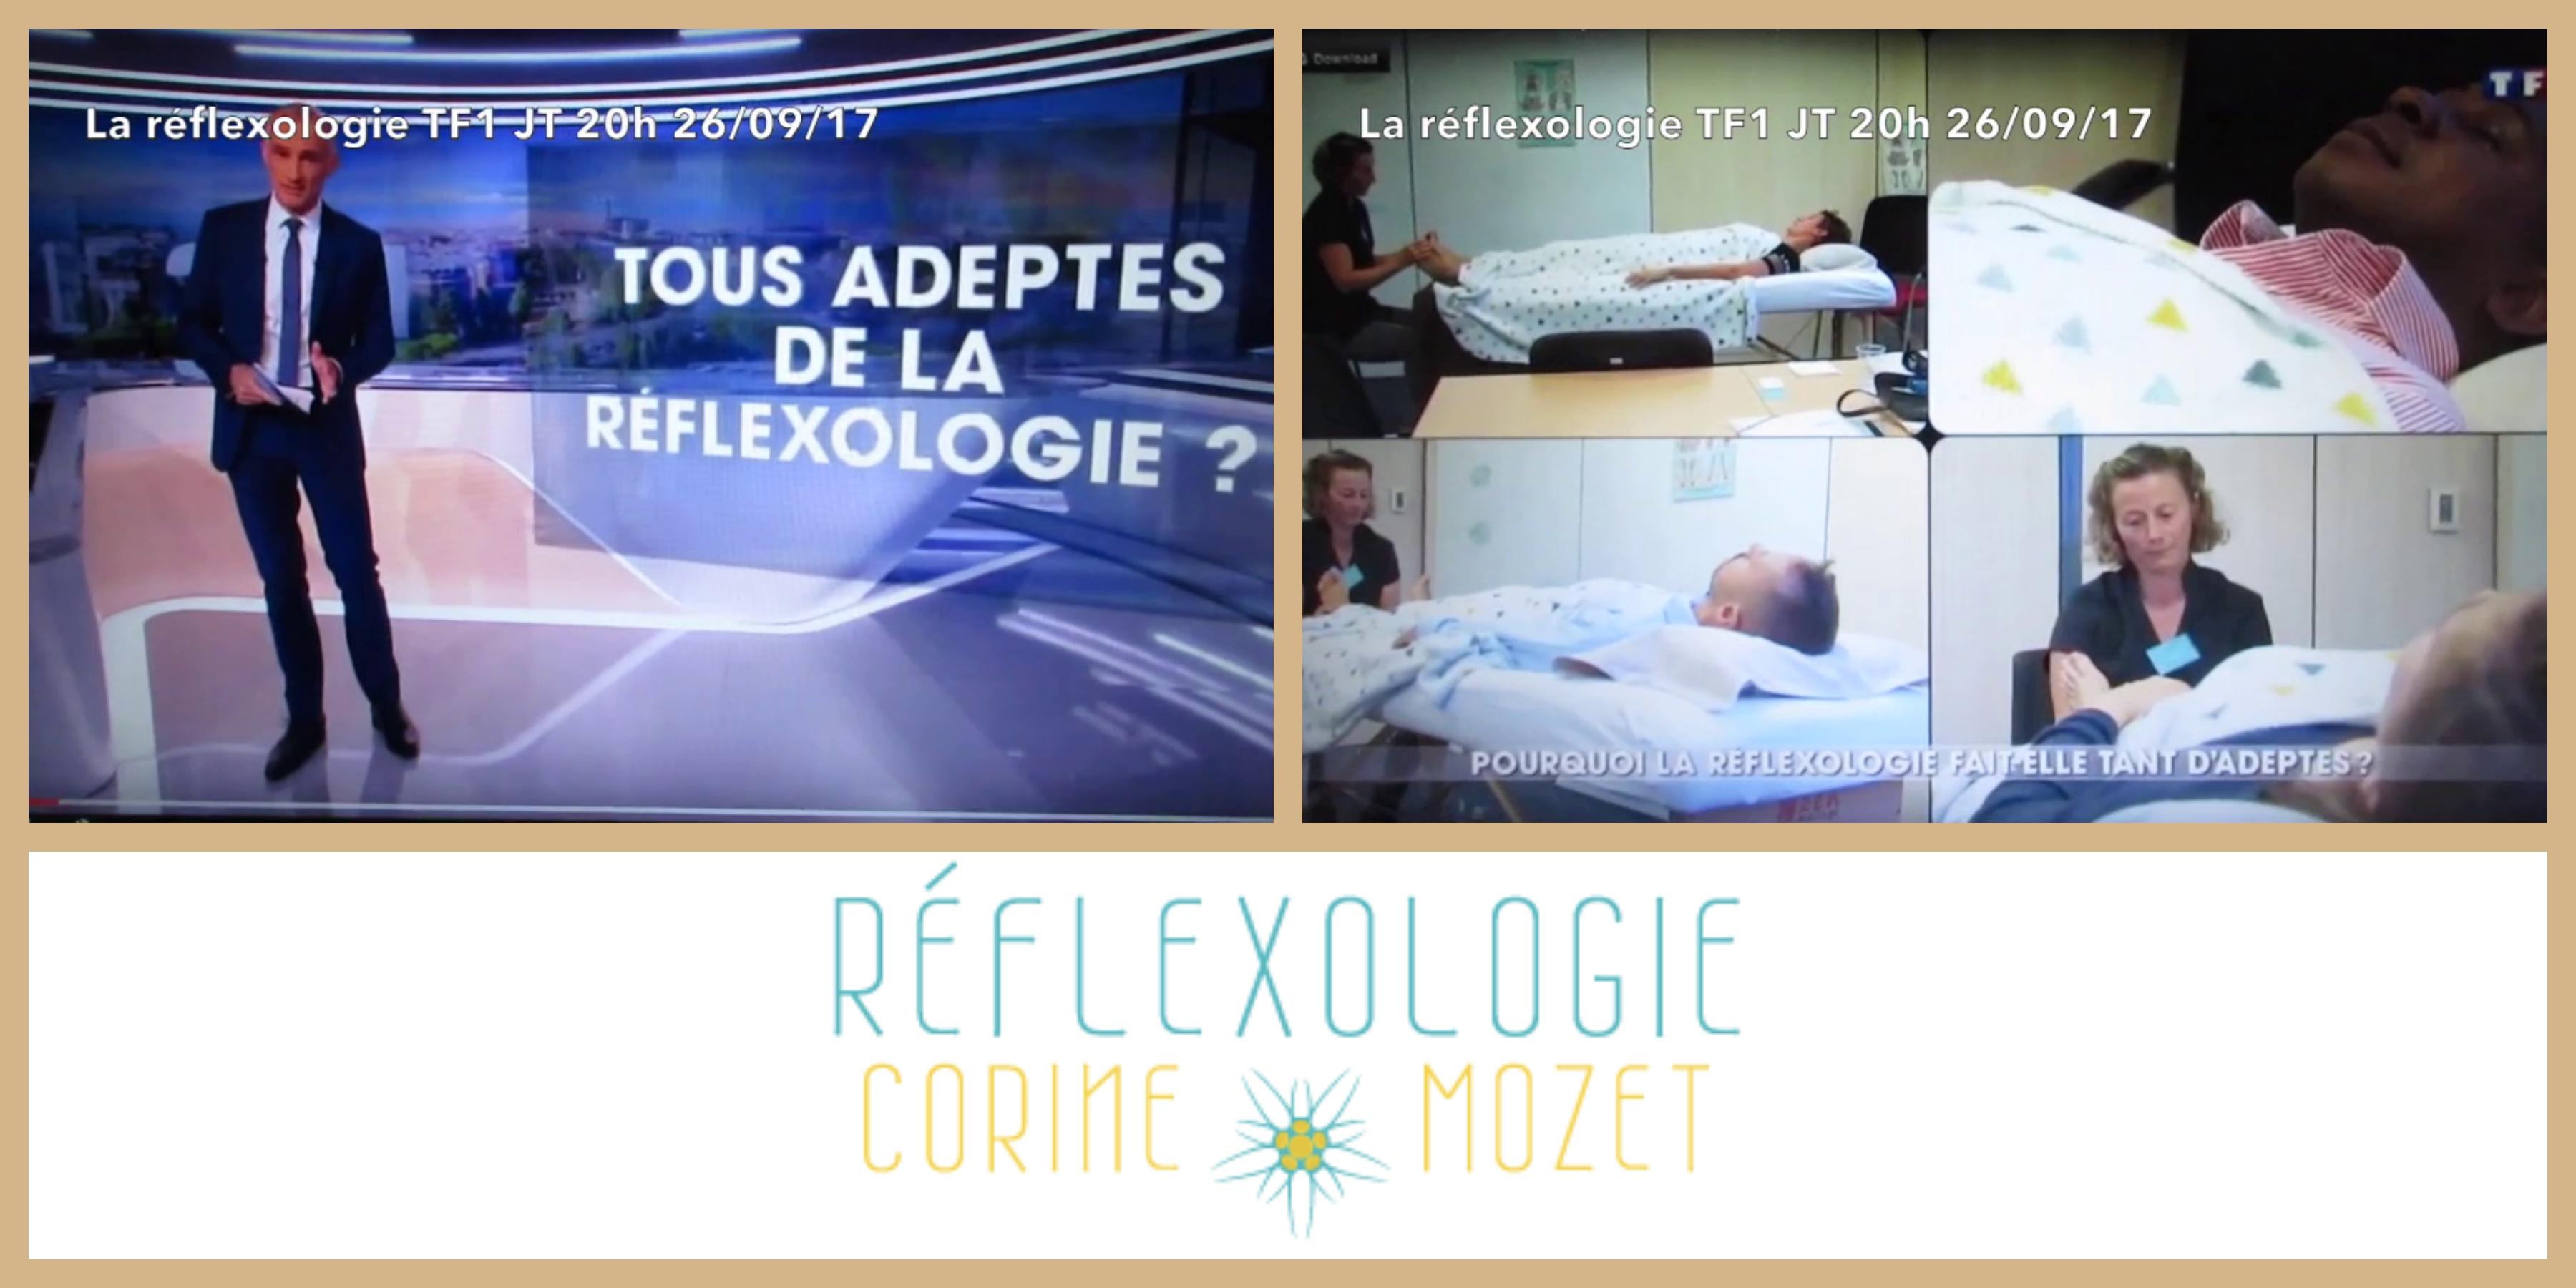 Réflexologie en entreprise_JTTF120h